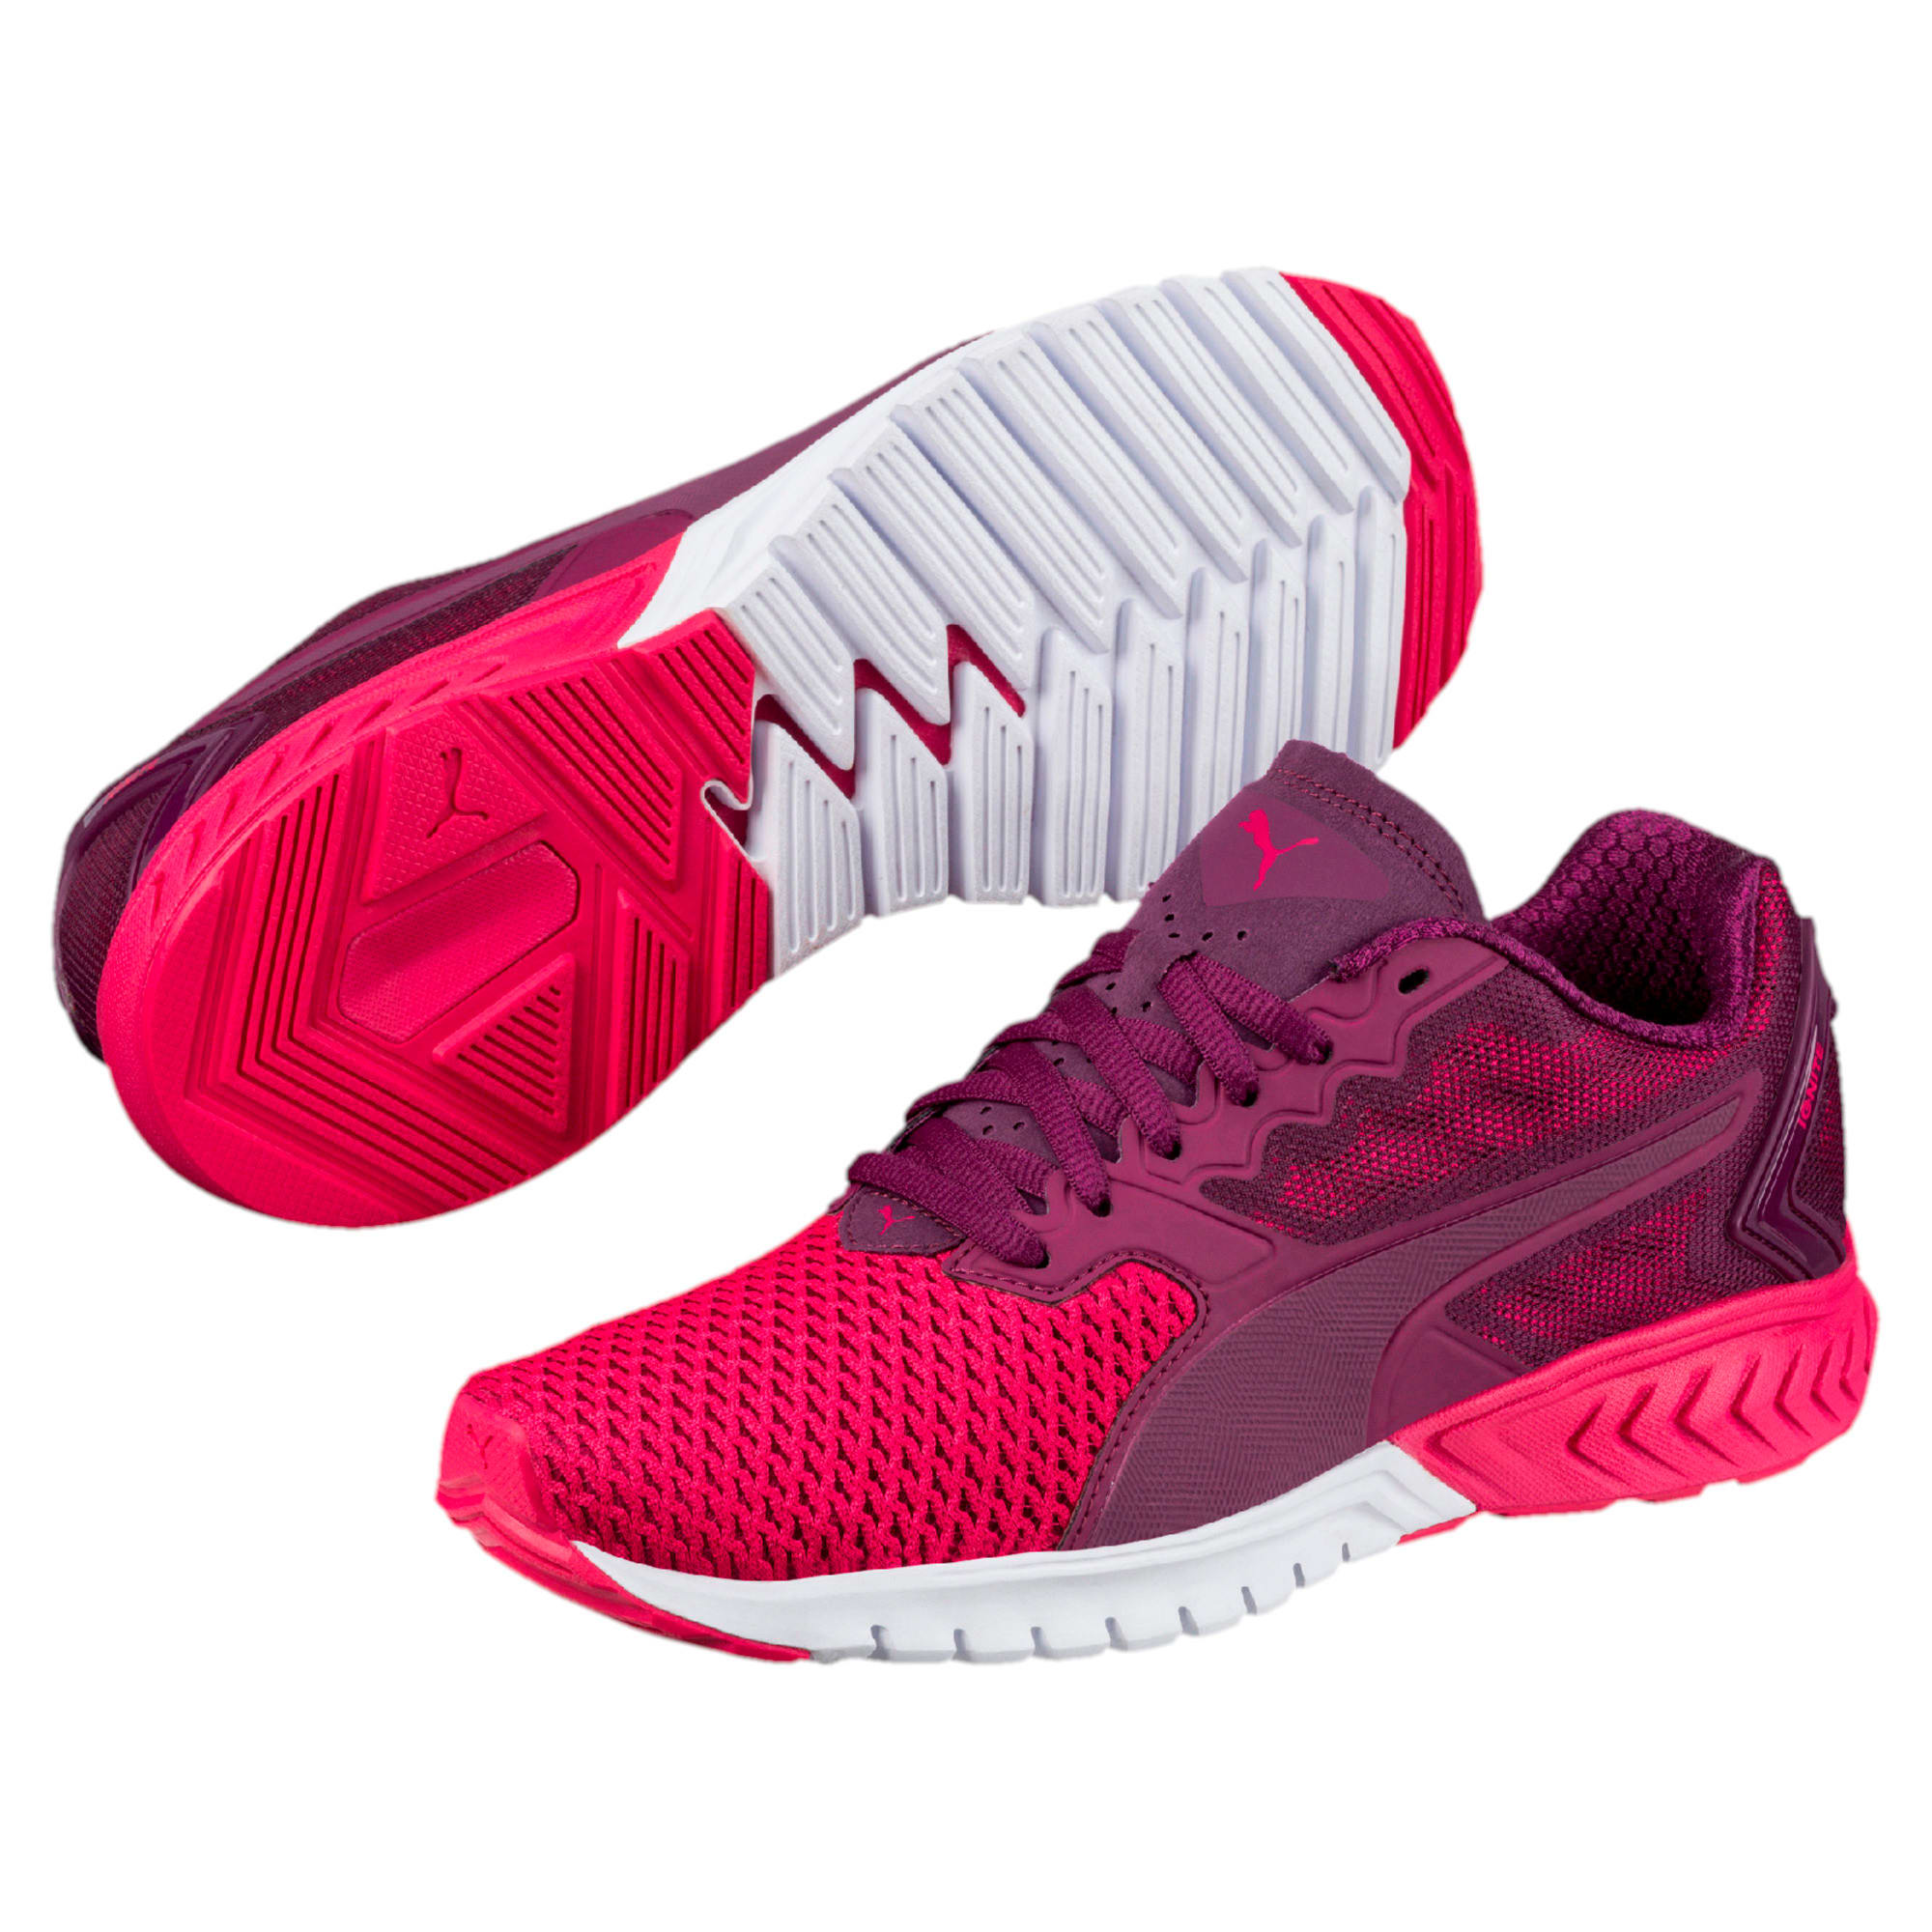 Thumbnail 6 of IGNITE Dual Mesh Women's Running Shoes, Dark Purple-Love Potion, medium-IND